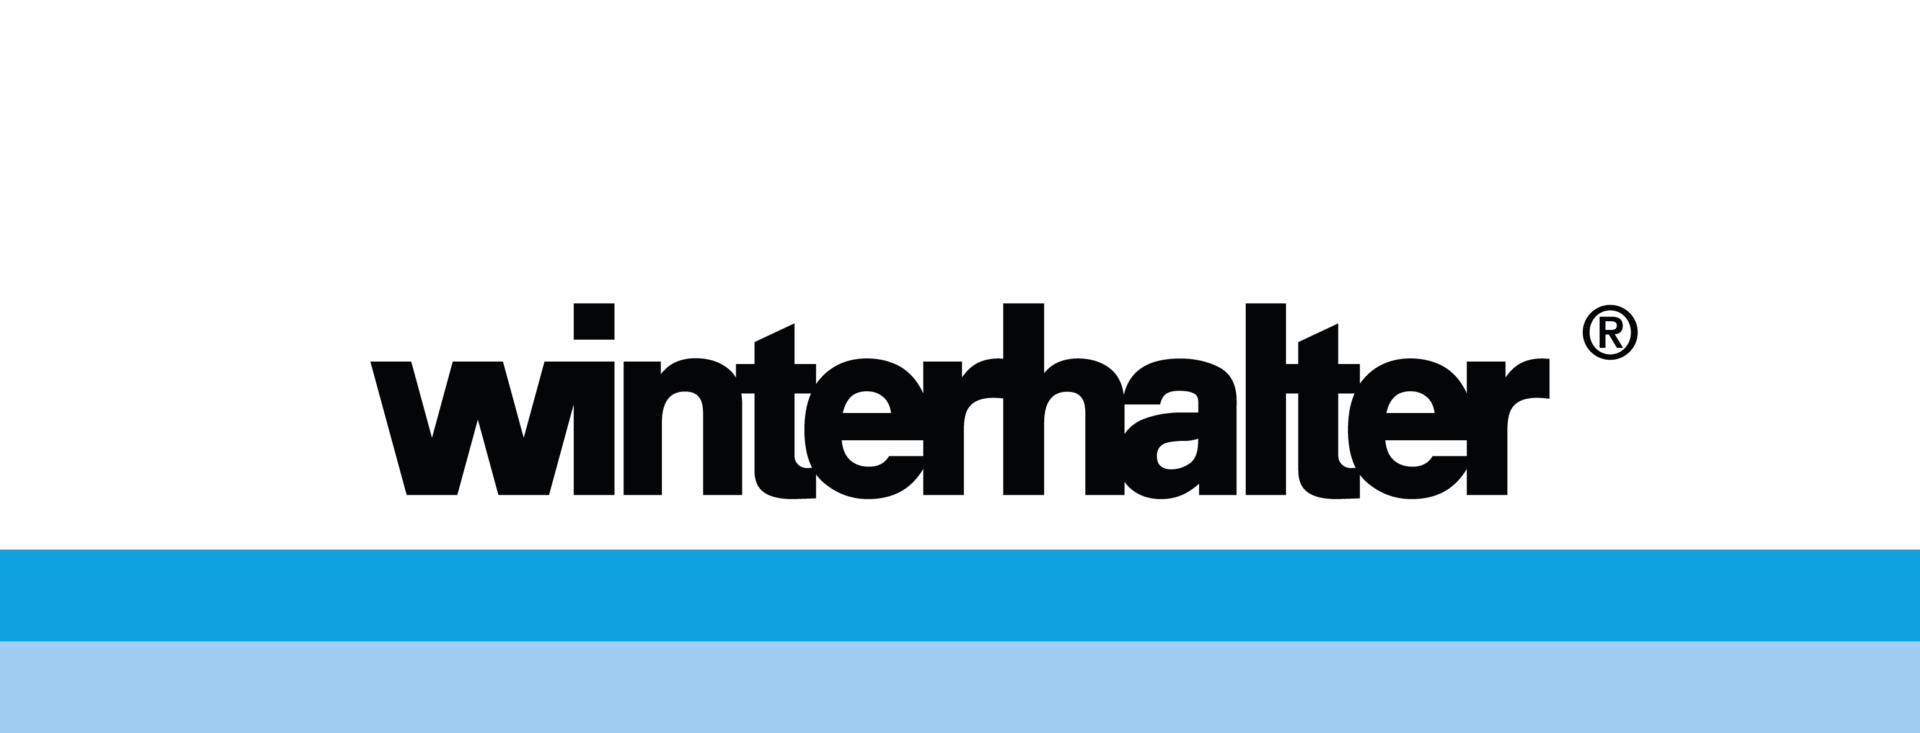 Winterhalter dishwasher repair